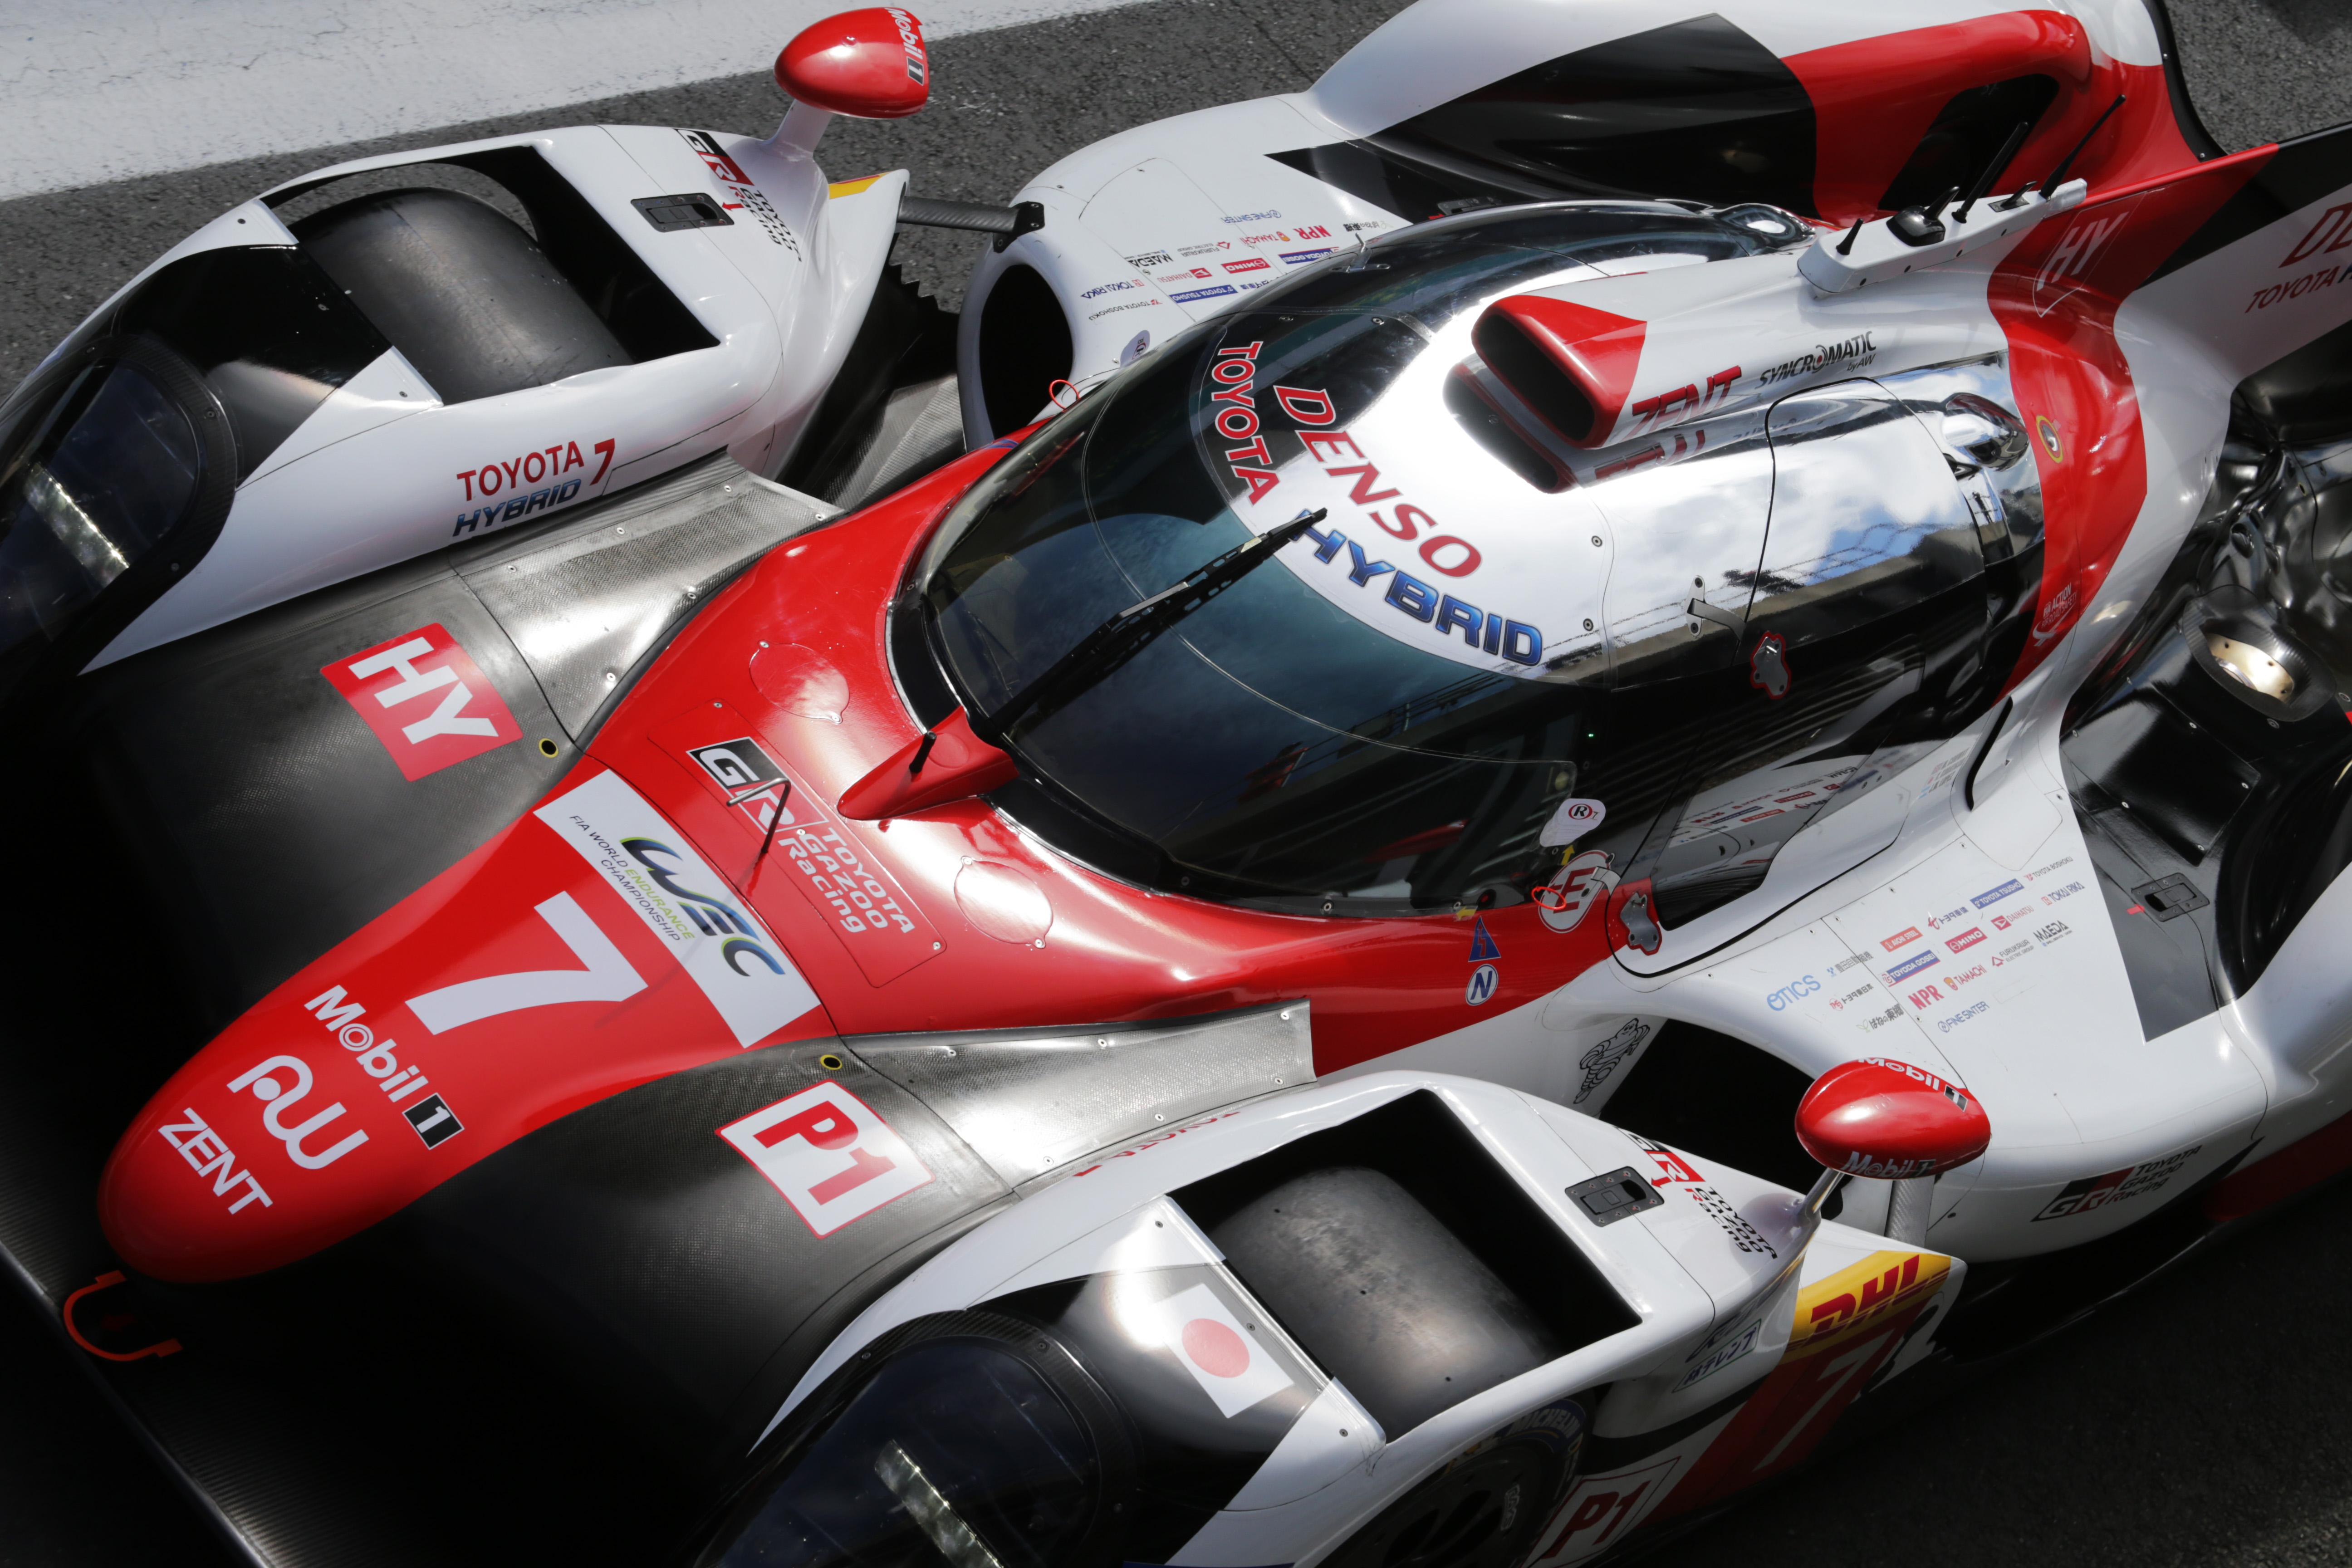 Motor Racing Fia World Endurance Championship Wec Round 1 Silverstone, England